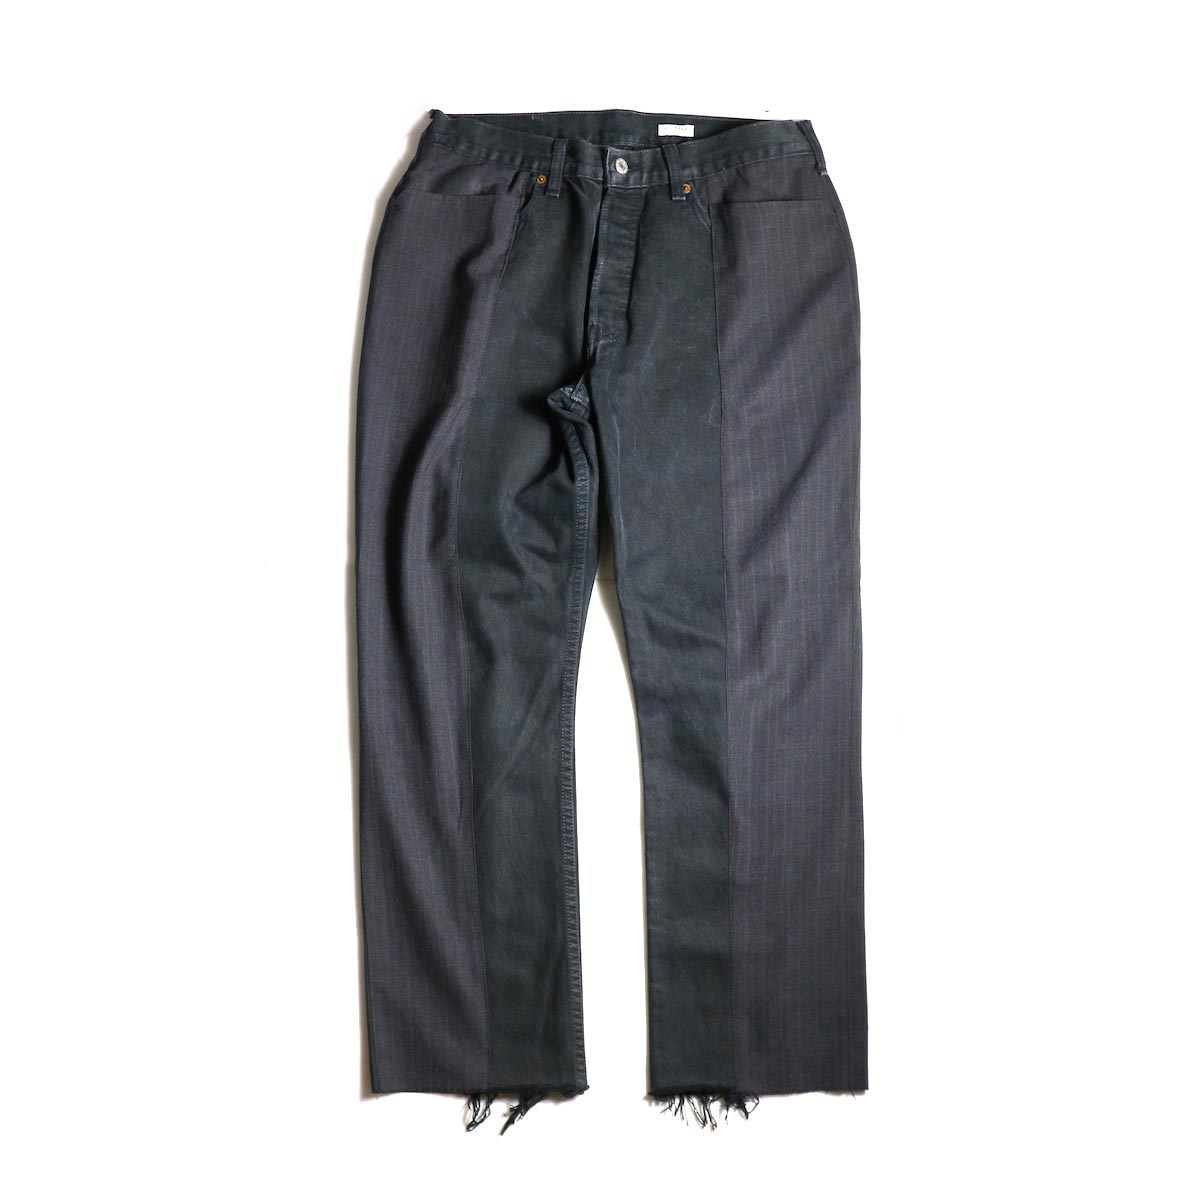 OLD PARK / Docking Jeans Black (Msize-A)